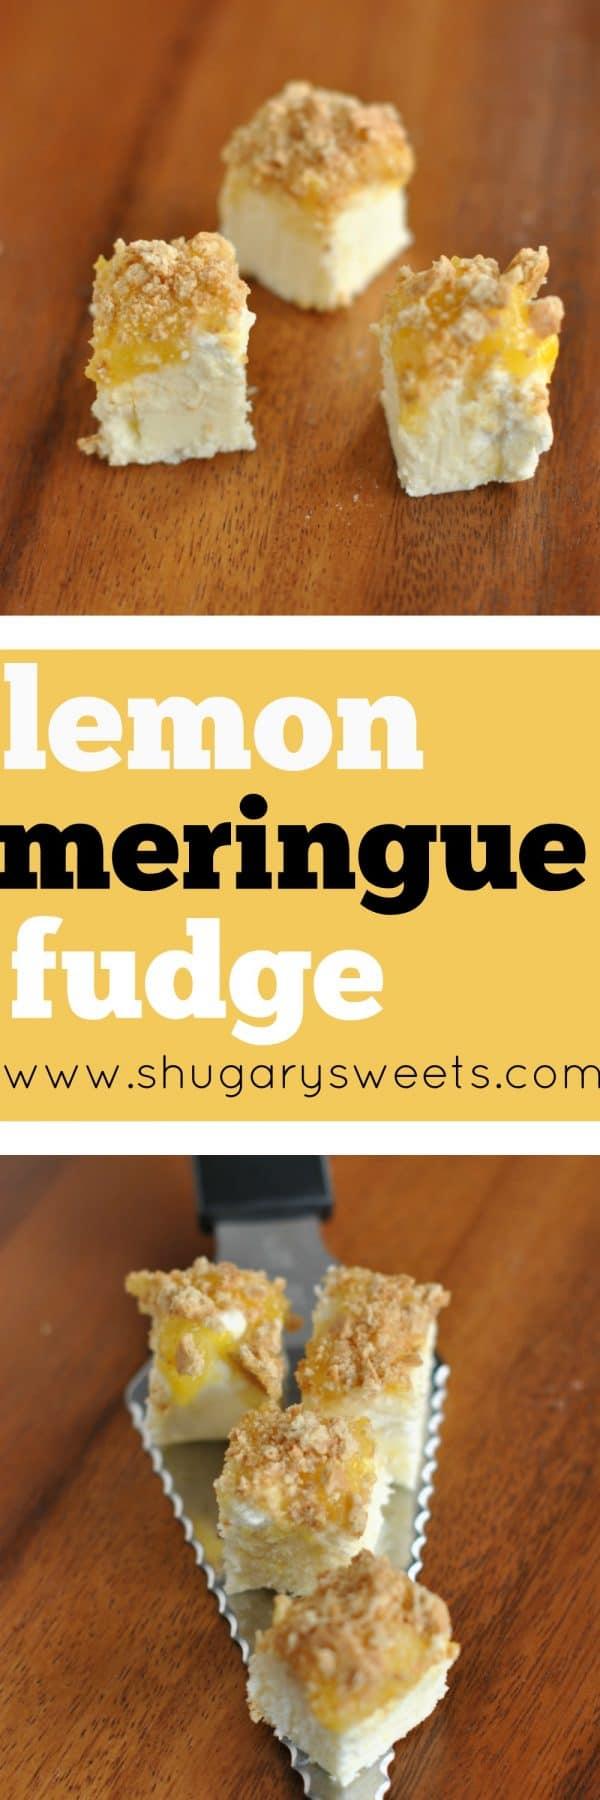 Easy, Delicious Lemon Meringue Pie Fudge Recipe